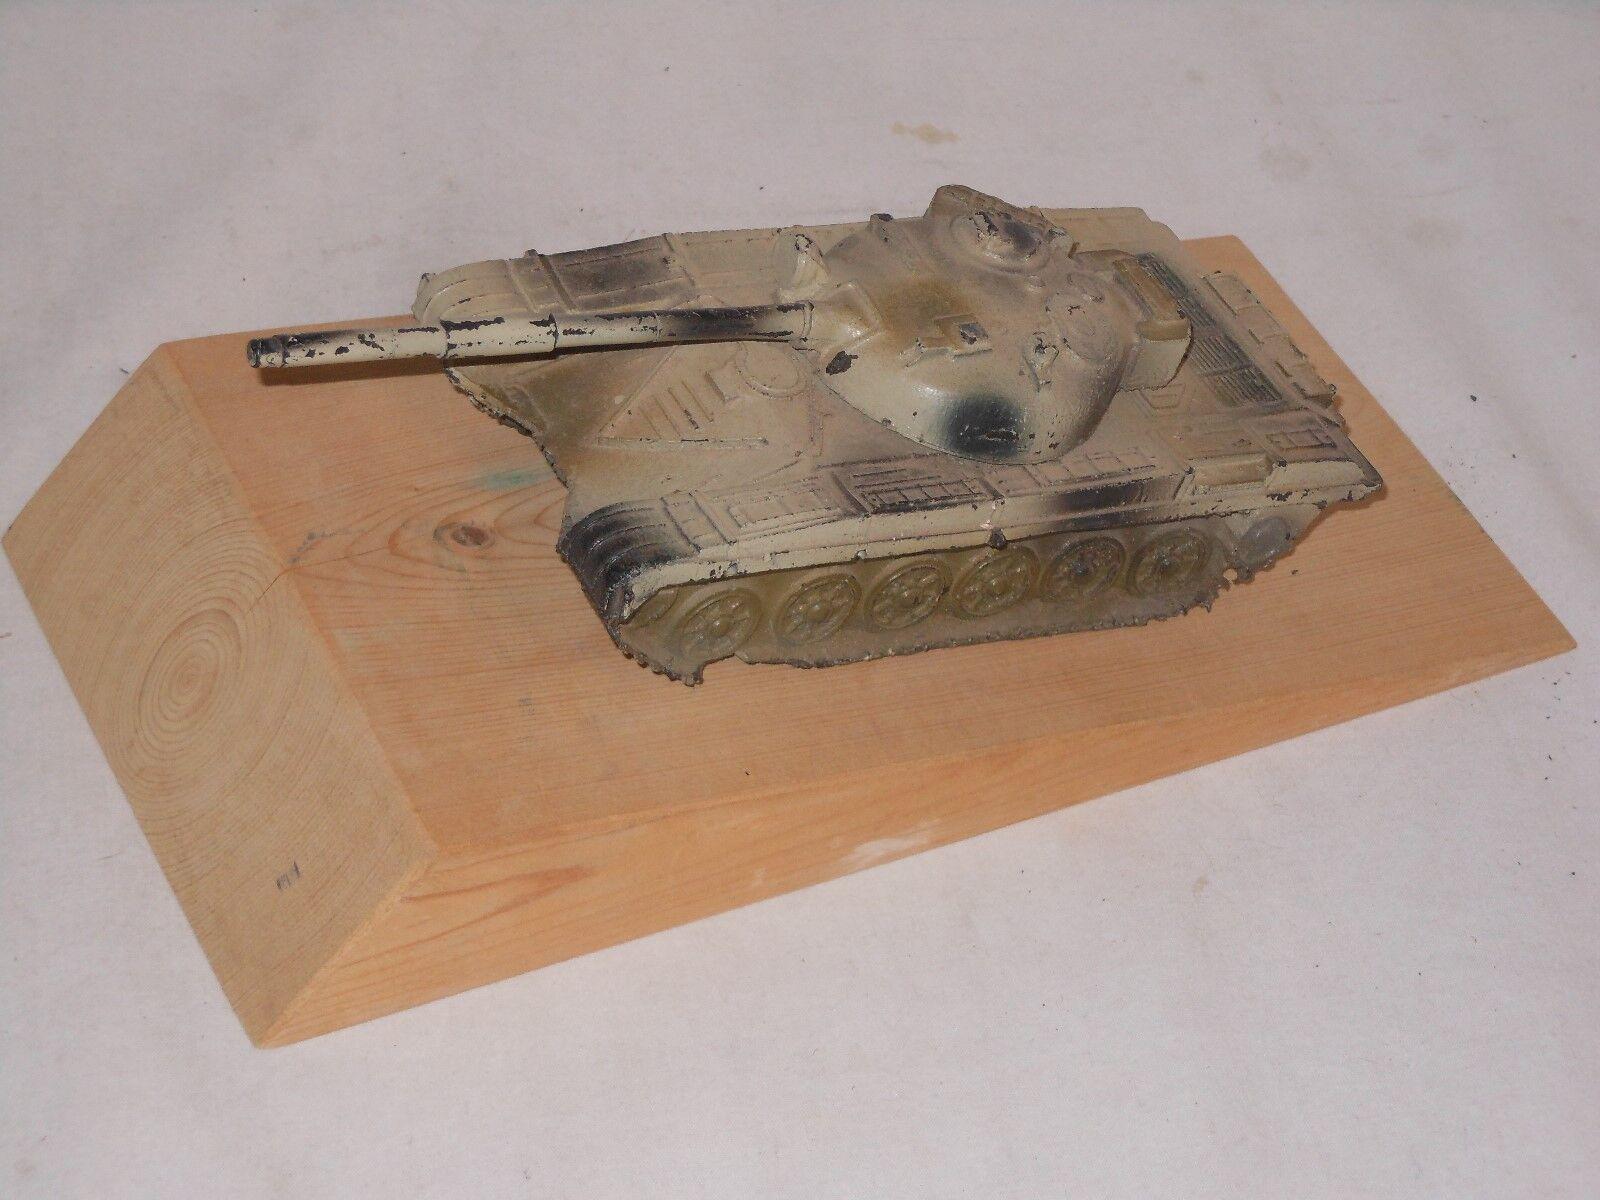 Us army formation modèle-Fort Knox-t 72 chars modèle-rda NVA 25 25 25 CM | Merveilleux  5c4fdc